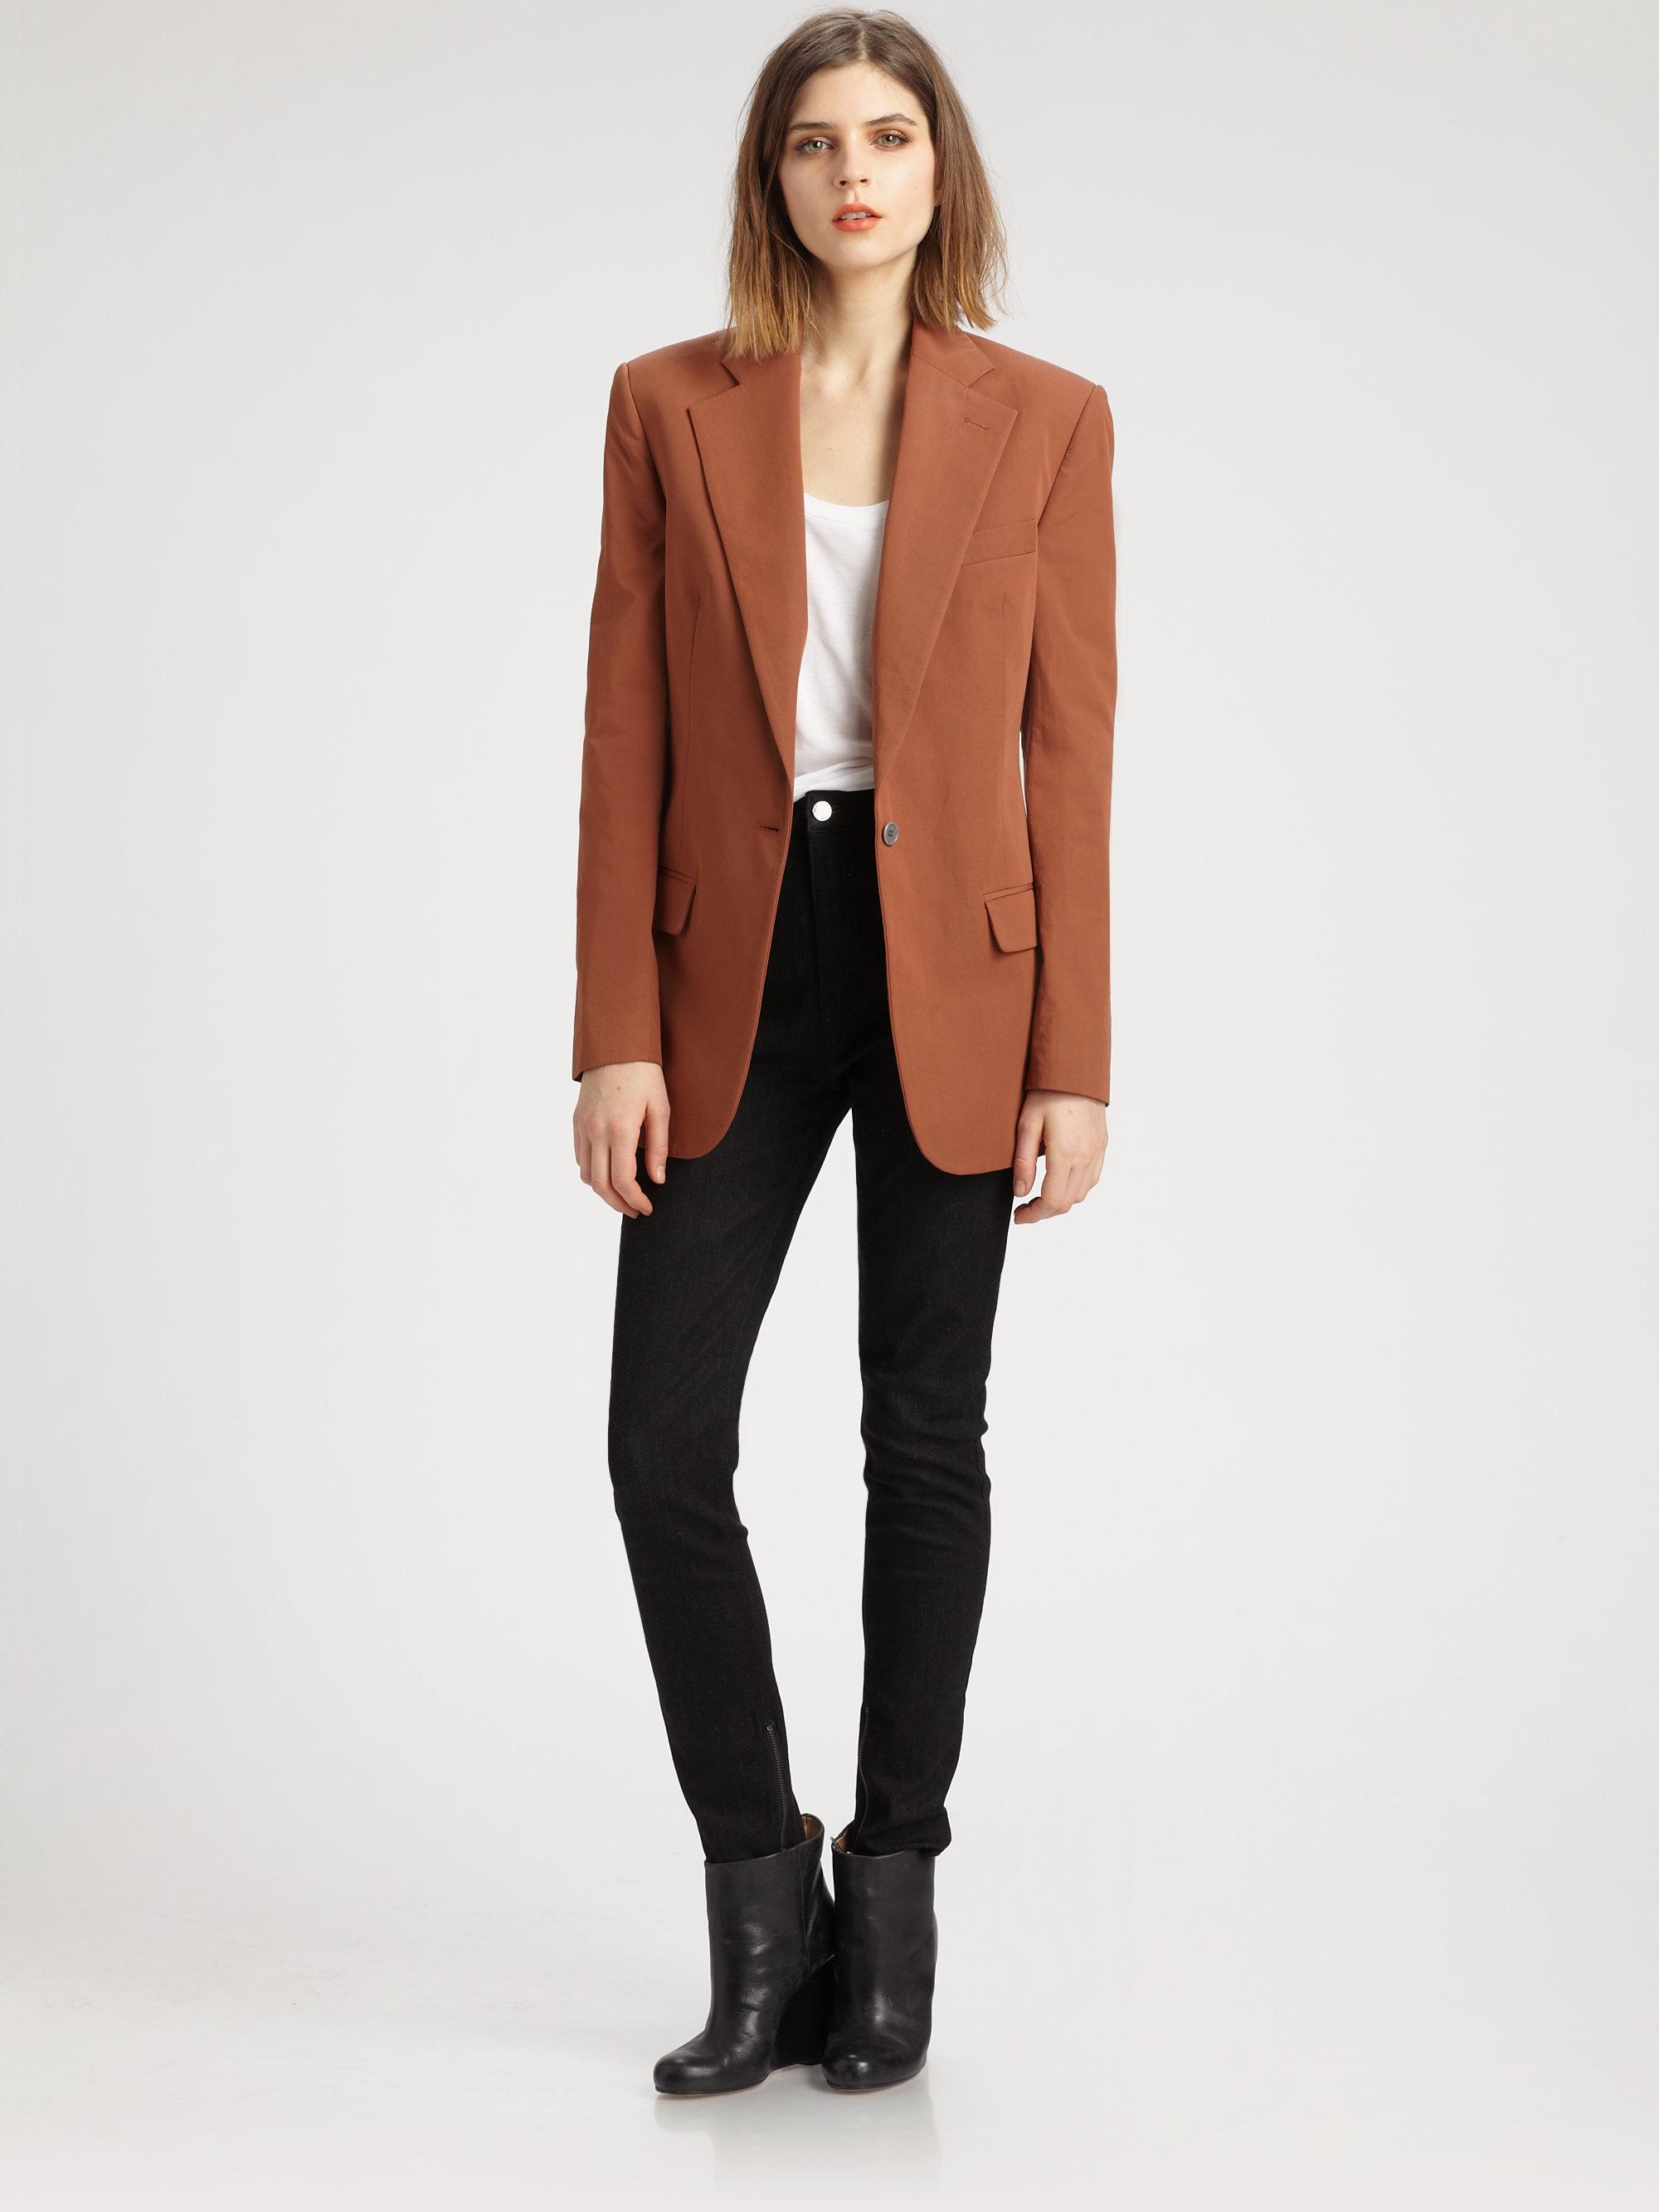 Blazer Formal para mujer Otoño Invierno moda Oficina